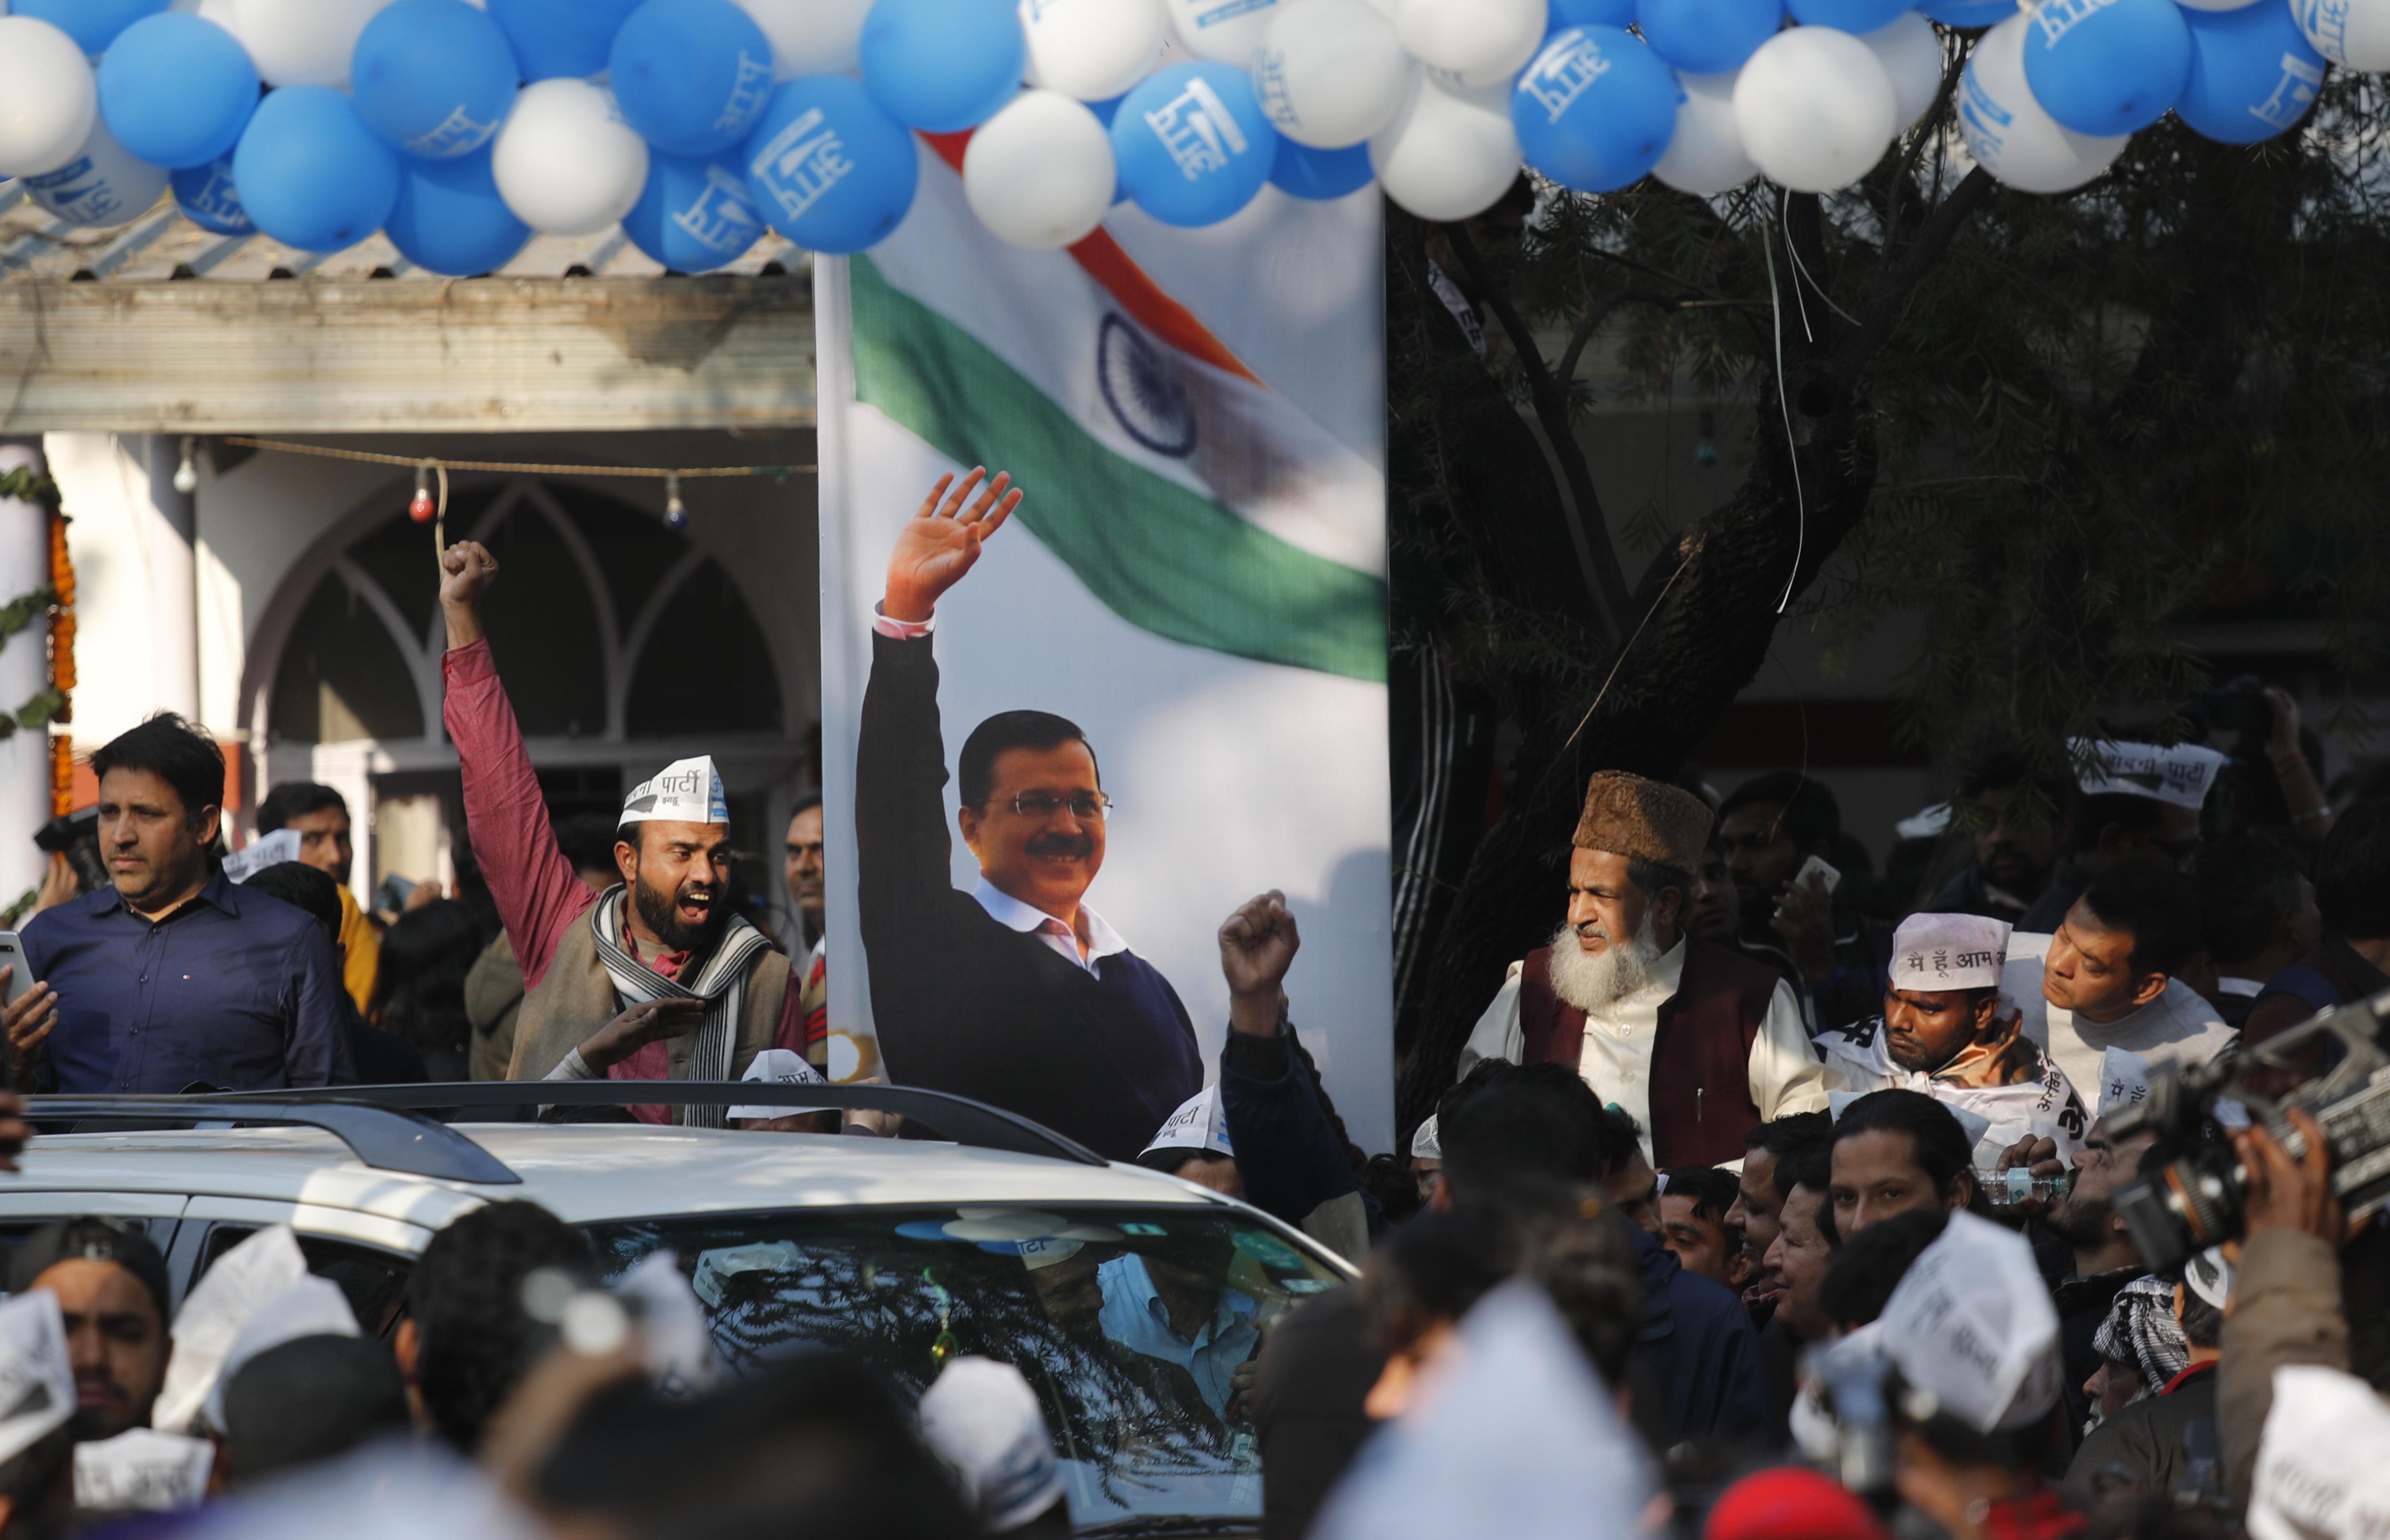 Narendra Modi concedes defeat in key New Delhi election